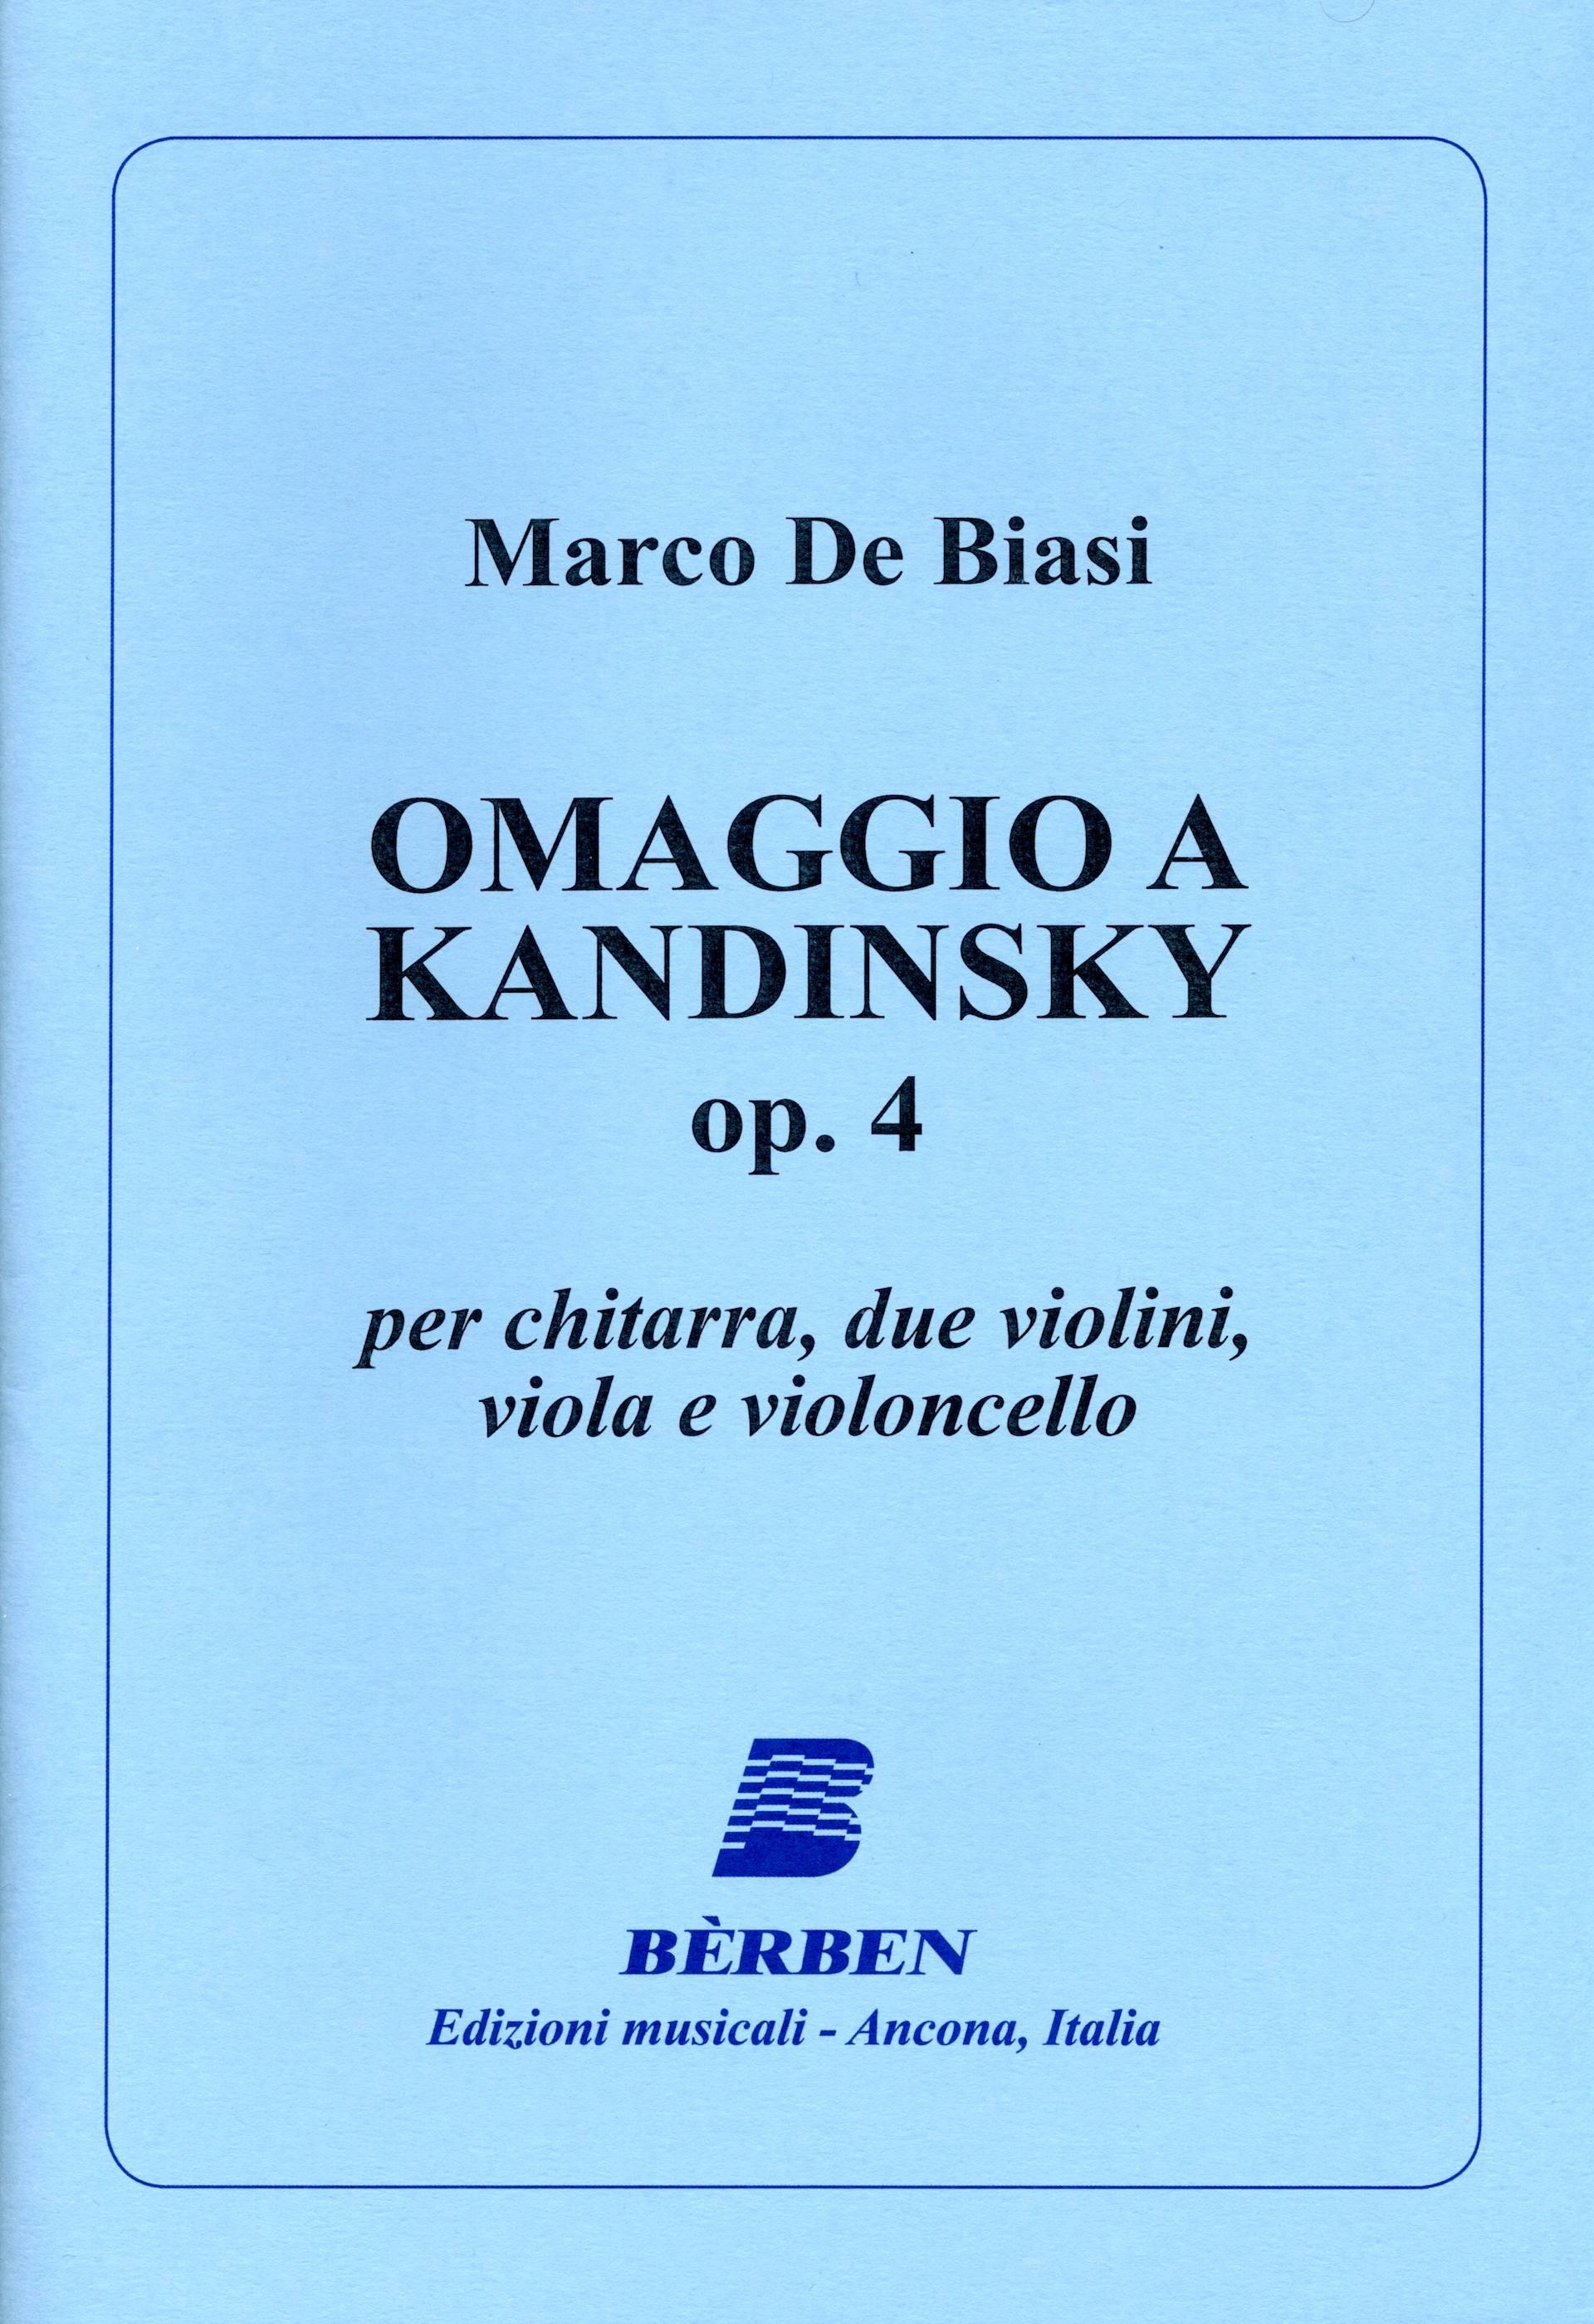 COPERTINA OMAGGIO A KANDINSKY - MARCO DE BIASI